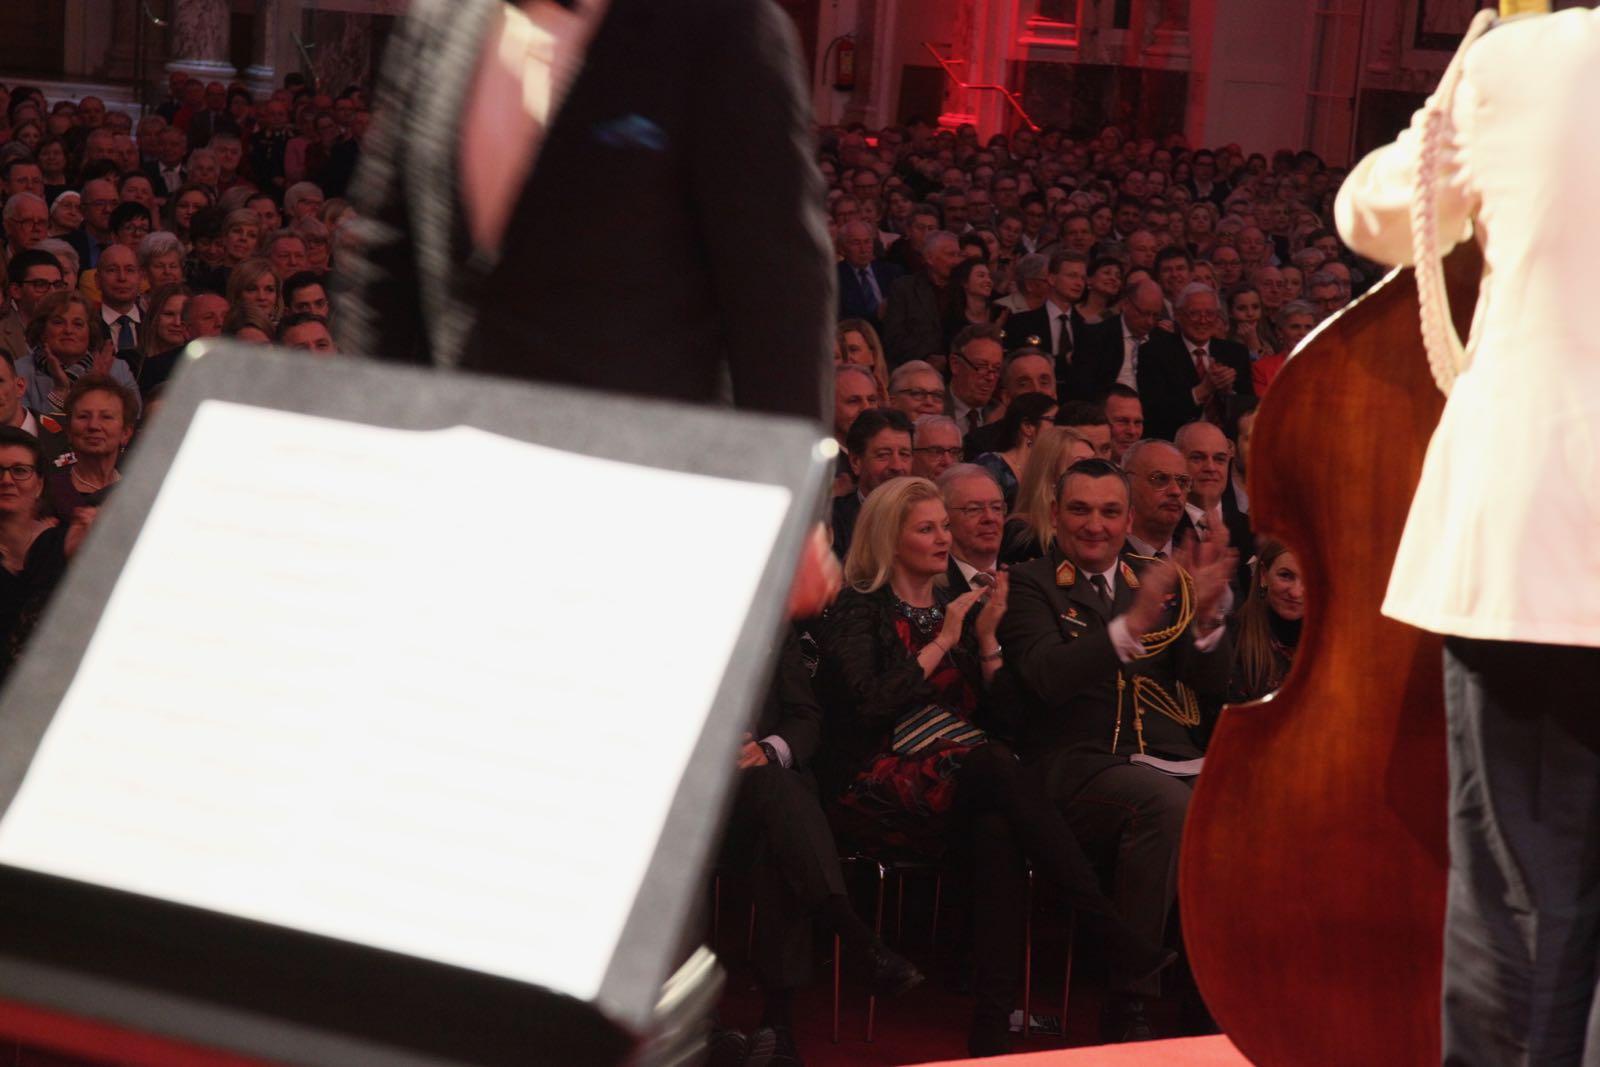 2019_03_14Gardemusik_Frühjahrskonzert_HBP_Hofburg - 56 of 177